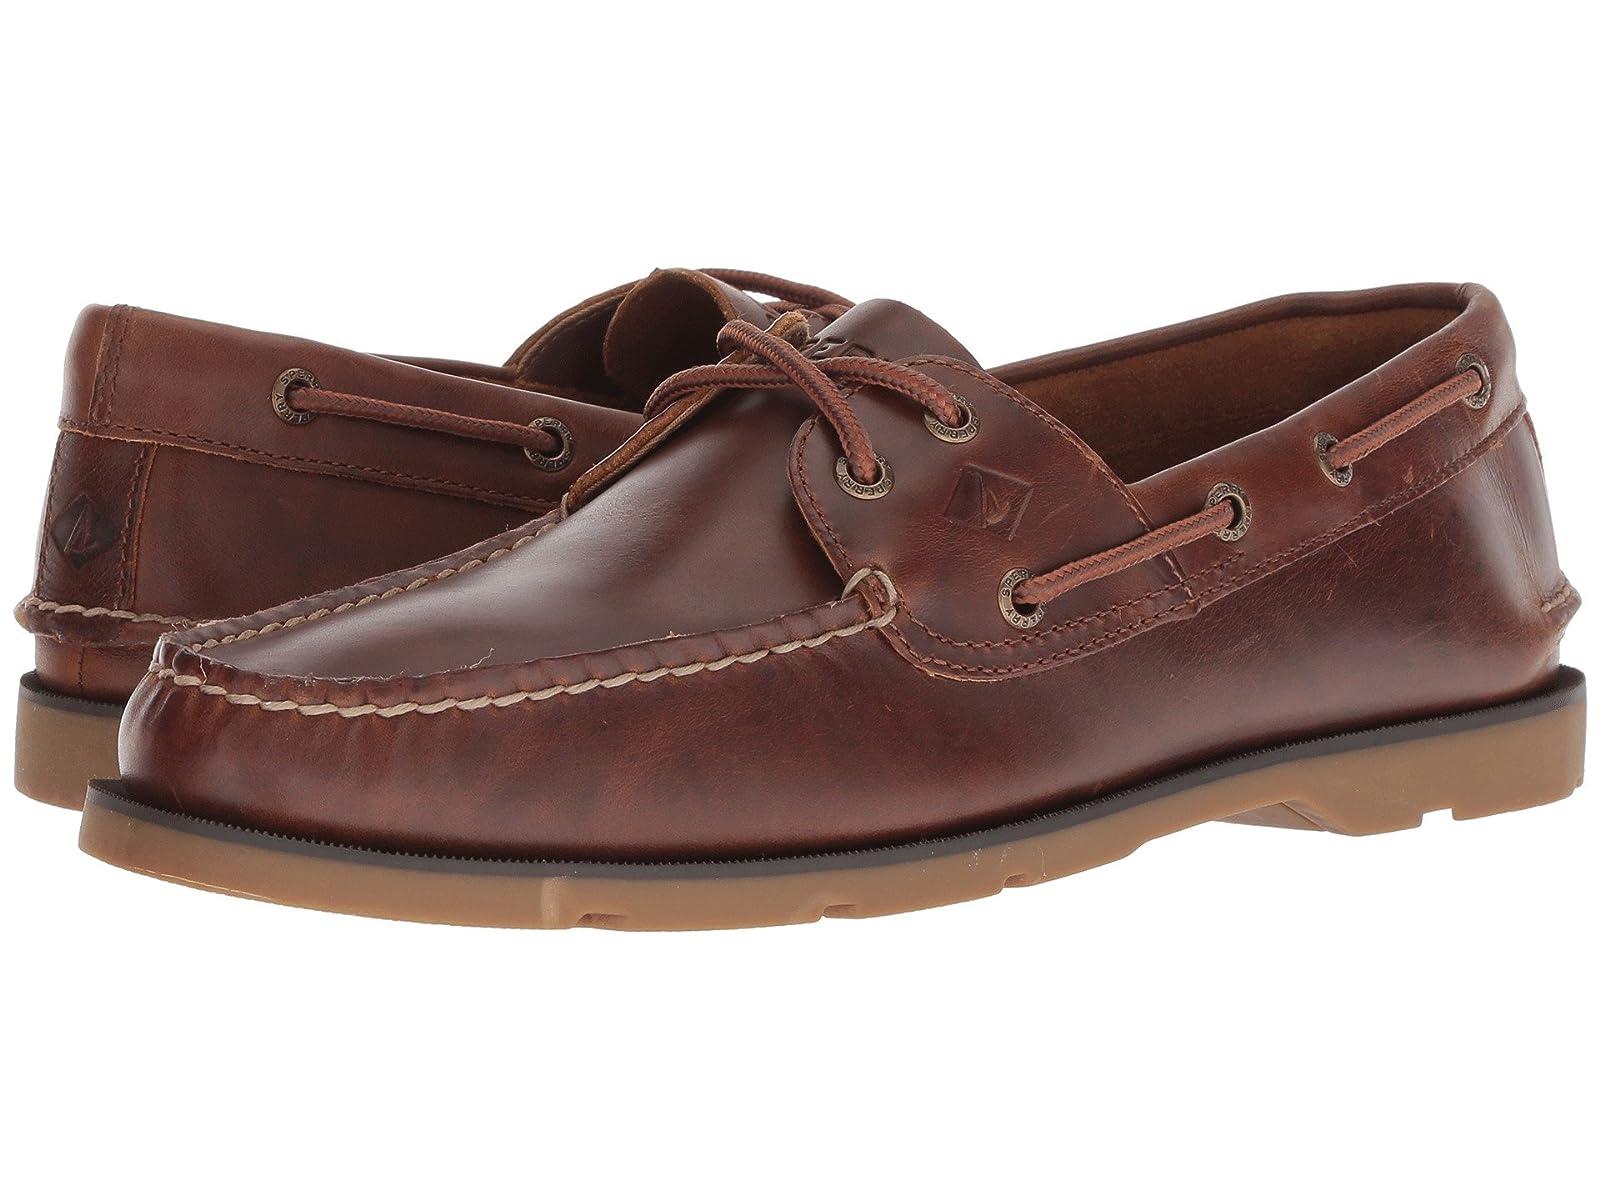 Sperry Leeward 2-Eye Yacht ClubCheap and distinctive eye-catching shoes